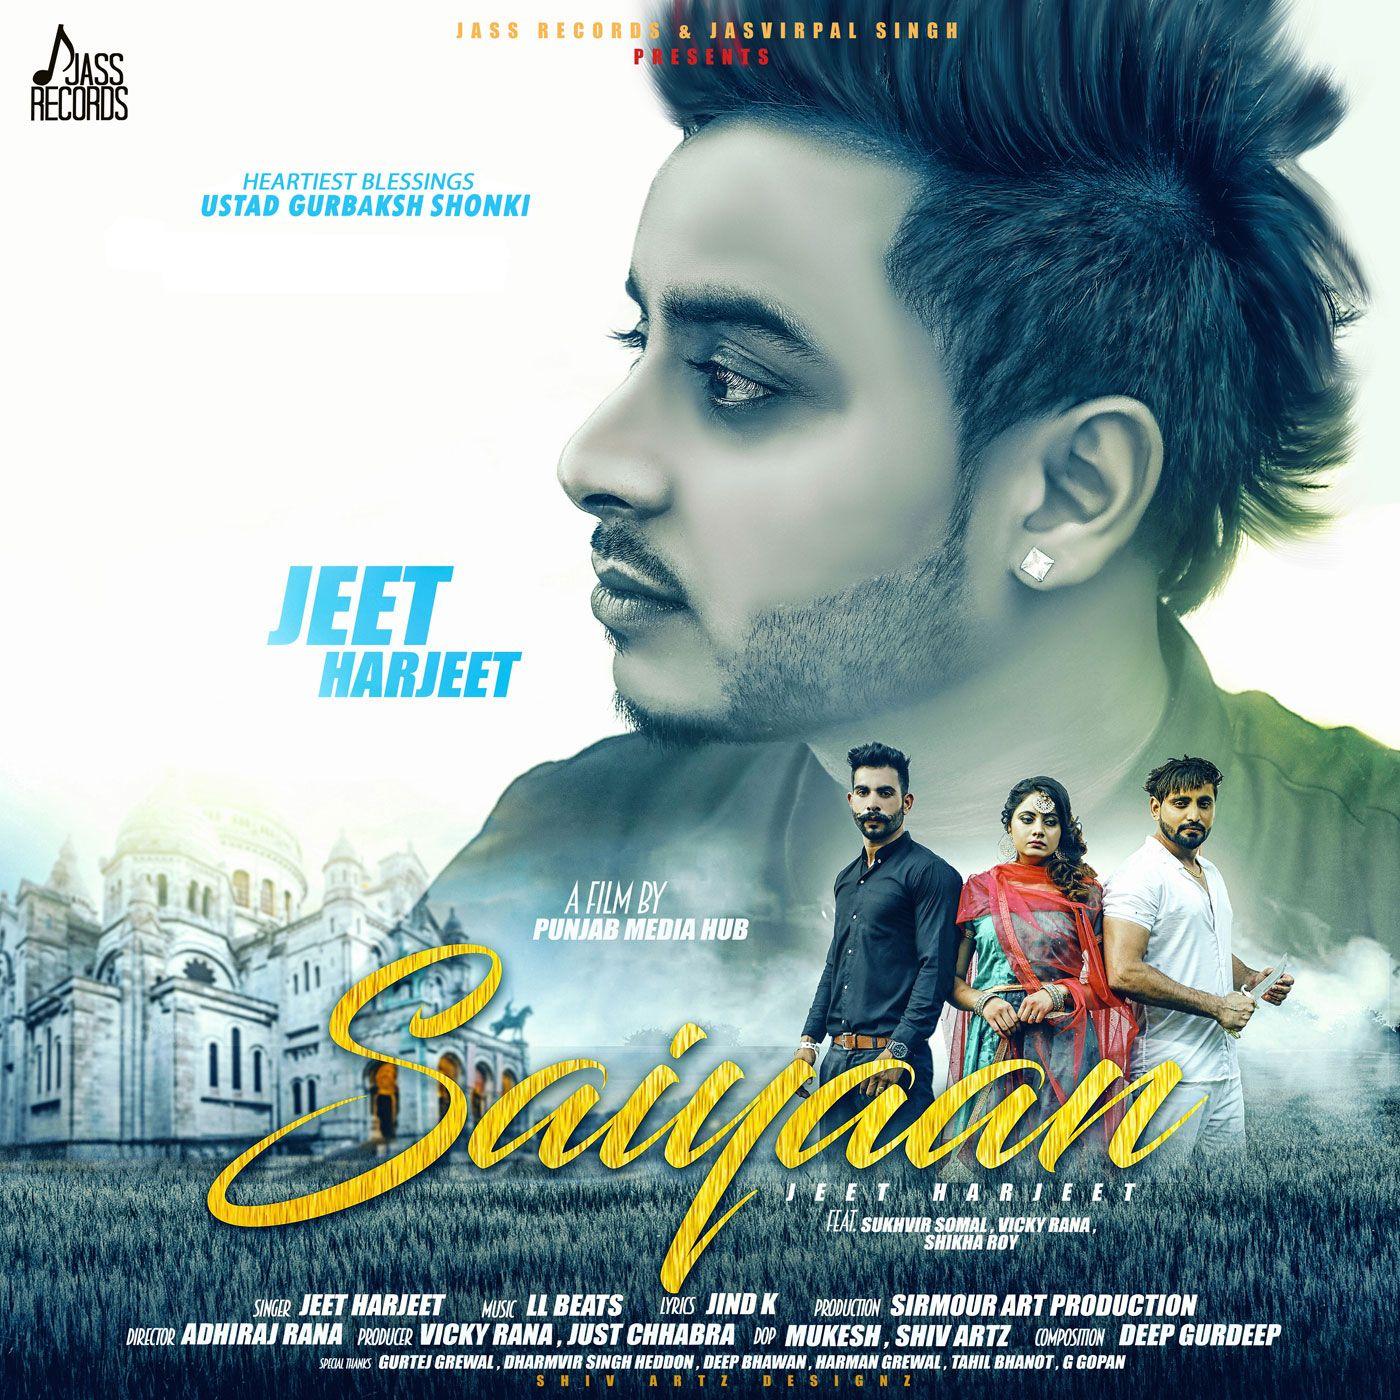 Saiyaan By Jeet Harjeet Mp3 Song Download Mp3 Song Songs